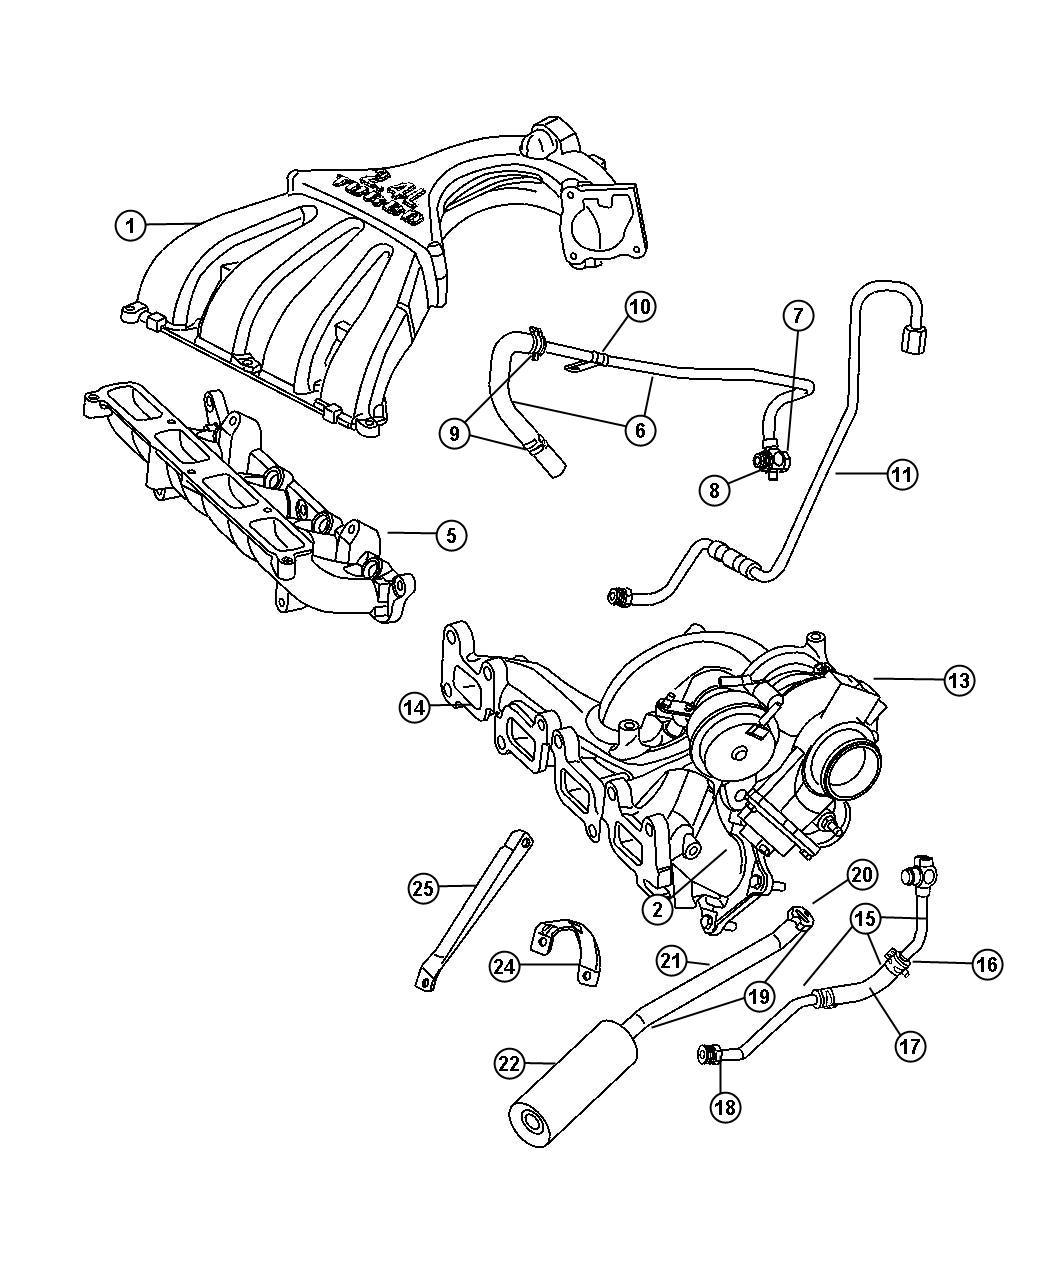 2006 pt cruiser 2 4l engine diagram 04852389aa mopar bolt  screw banjo  banjo connector  04852389aa mopar bolt  screw banjo  banjo connector